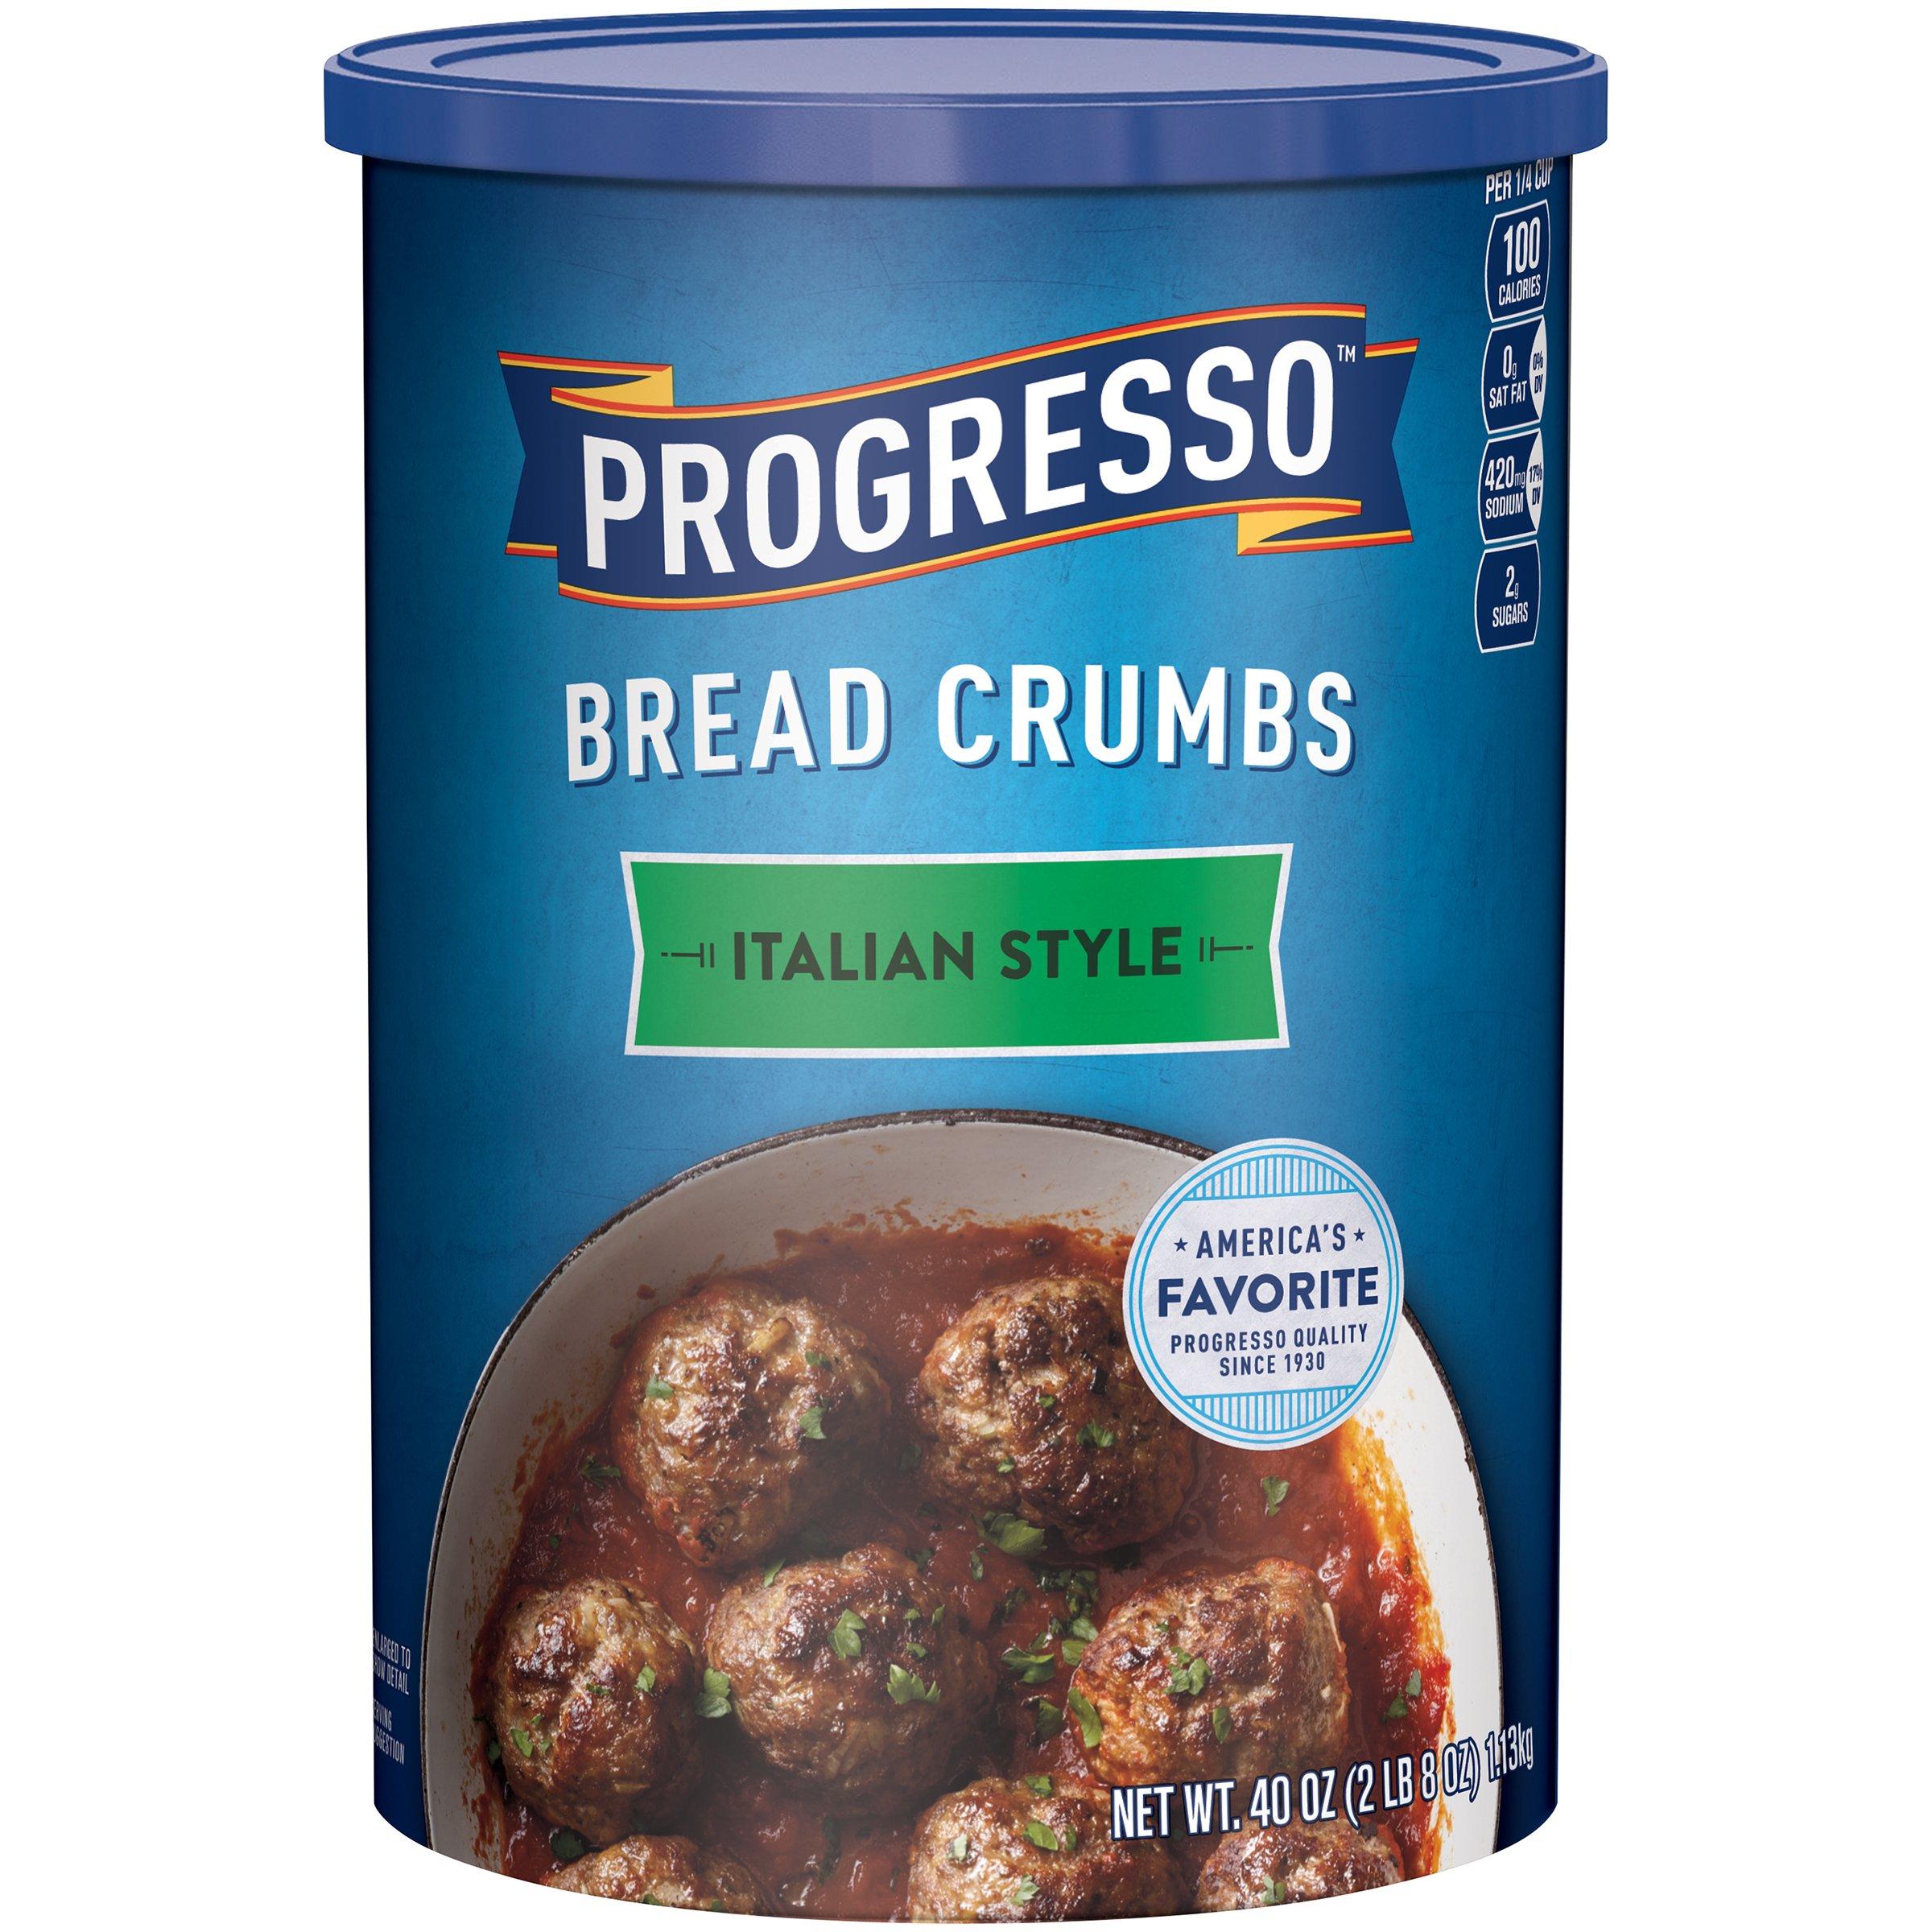 Progresso Italian Style Bread Crumbs, 40 Ounce